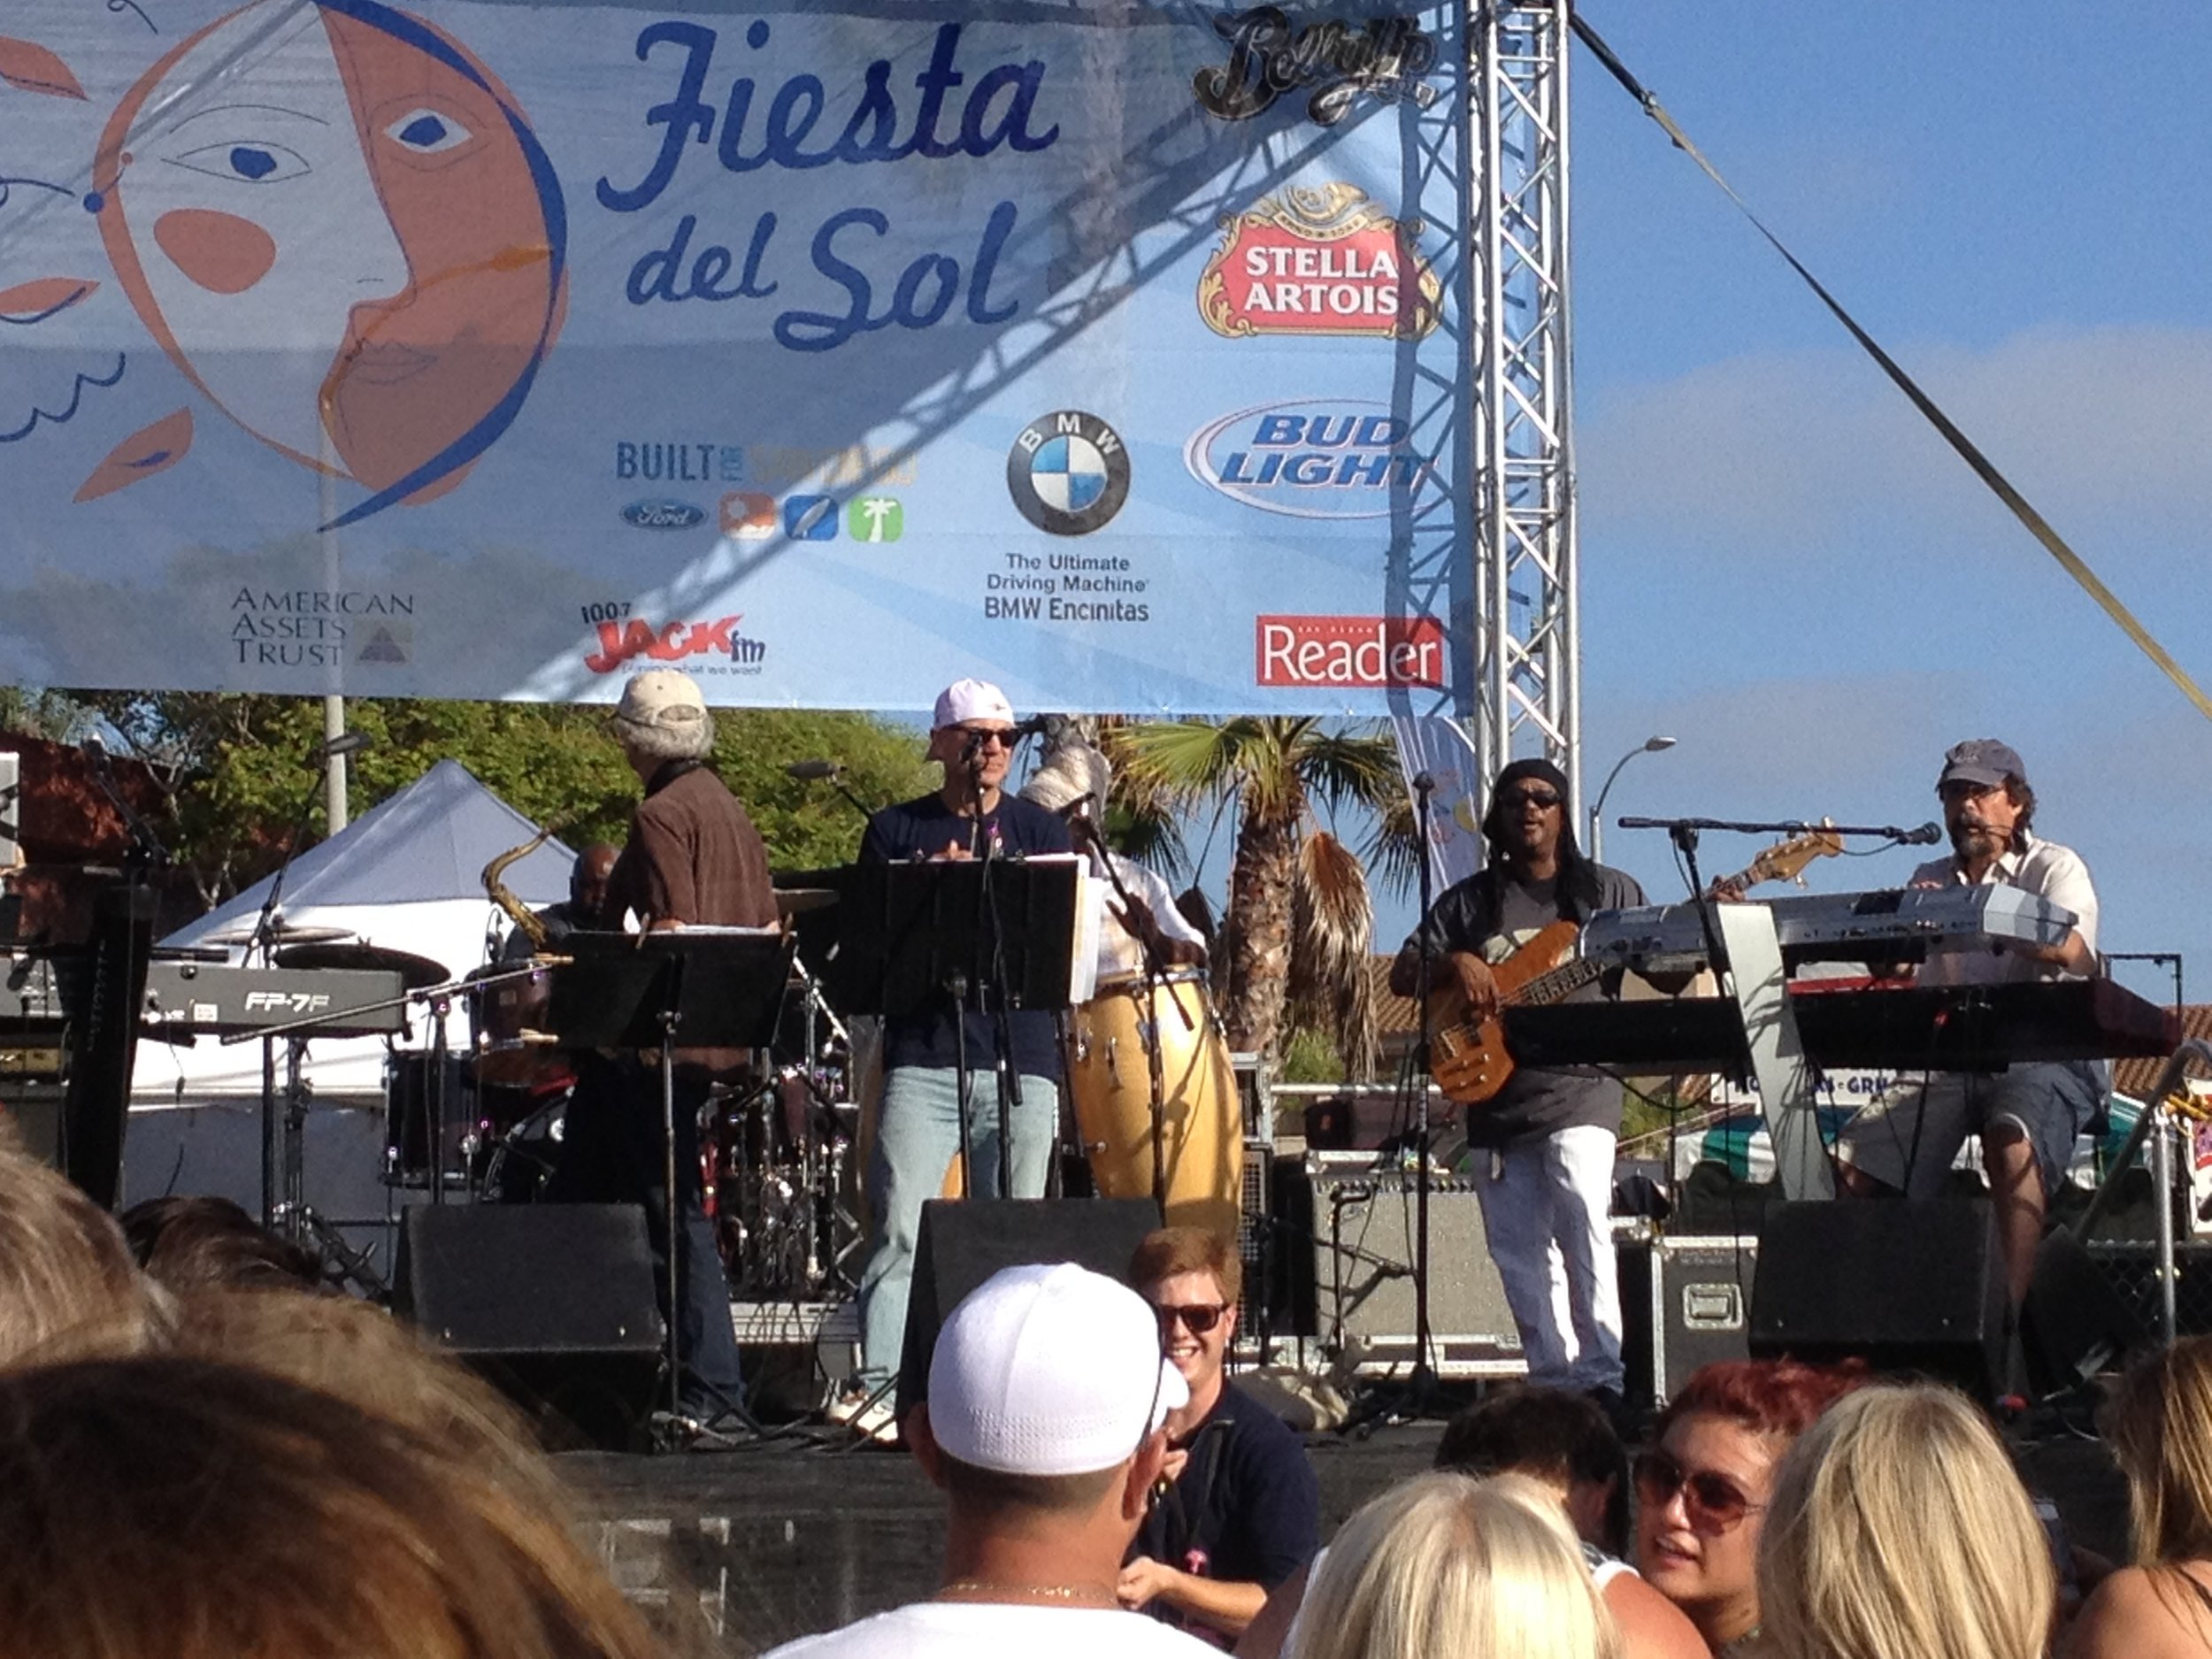 Rocking Fiesta Del Sol